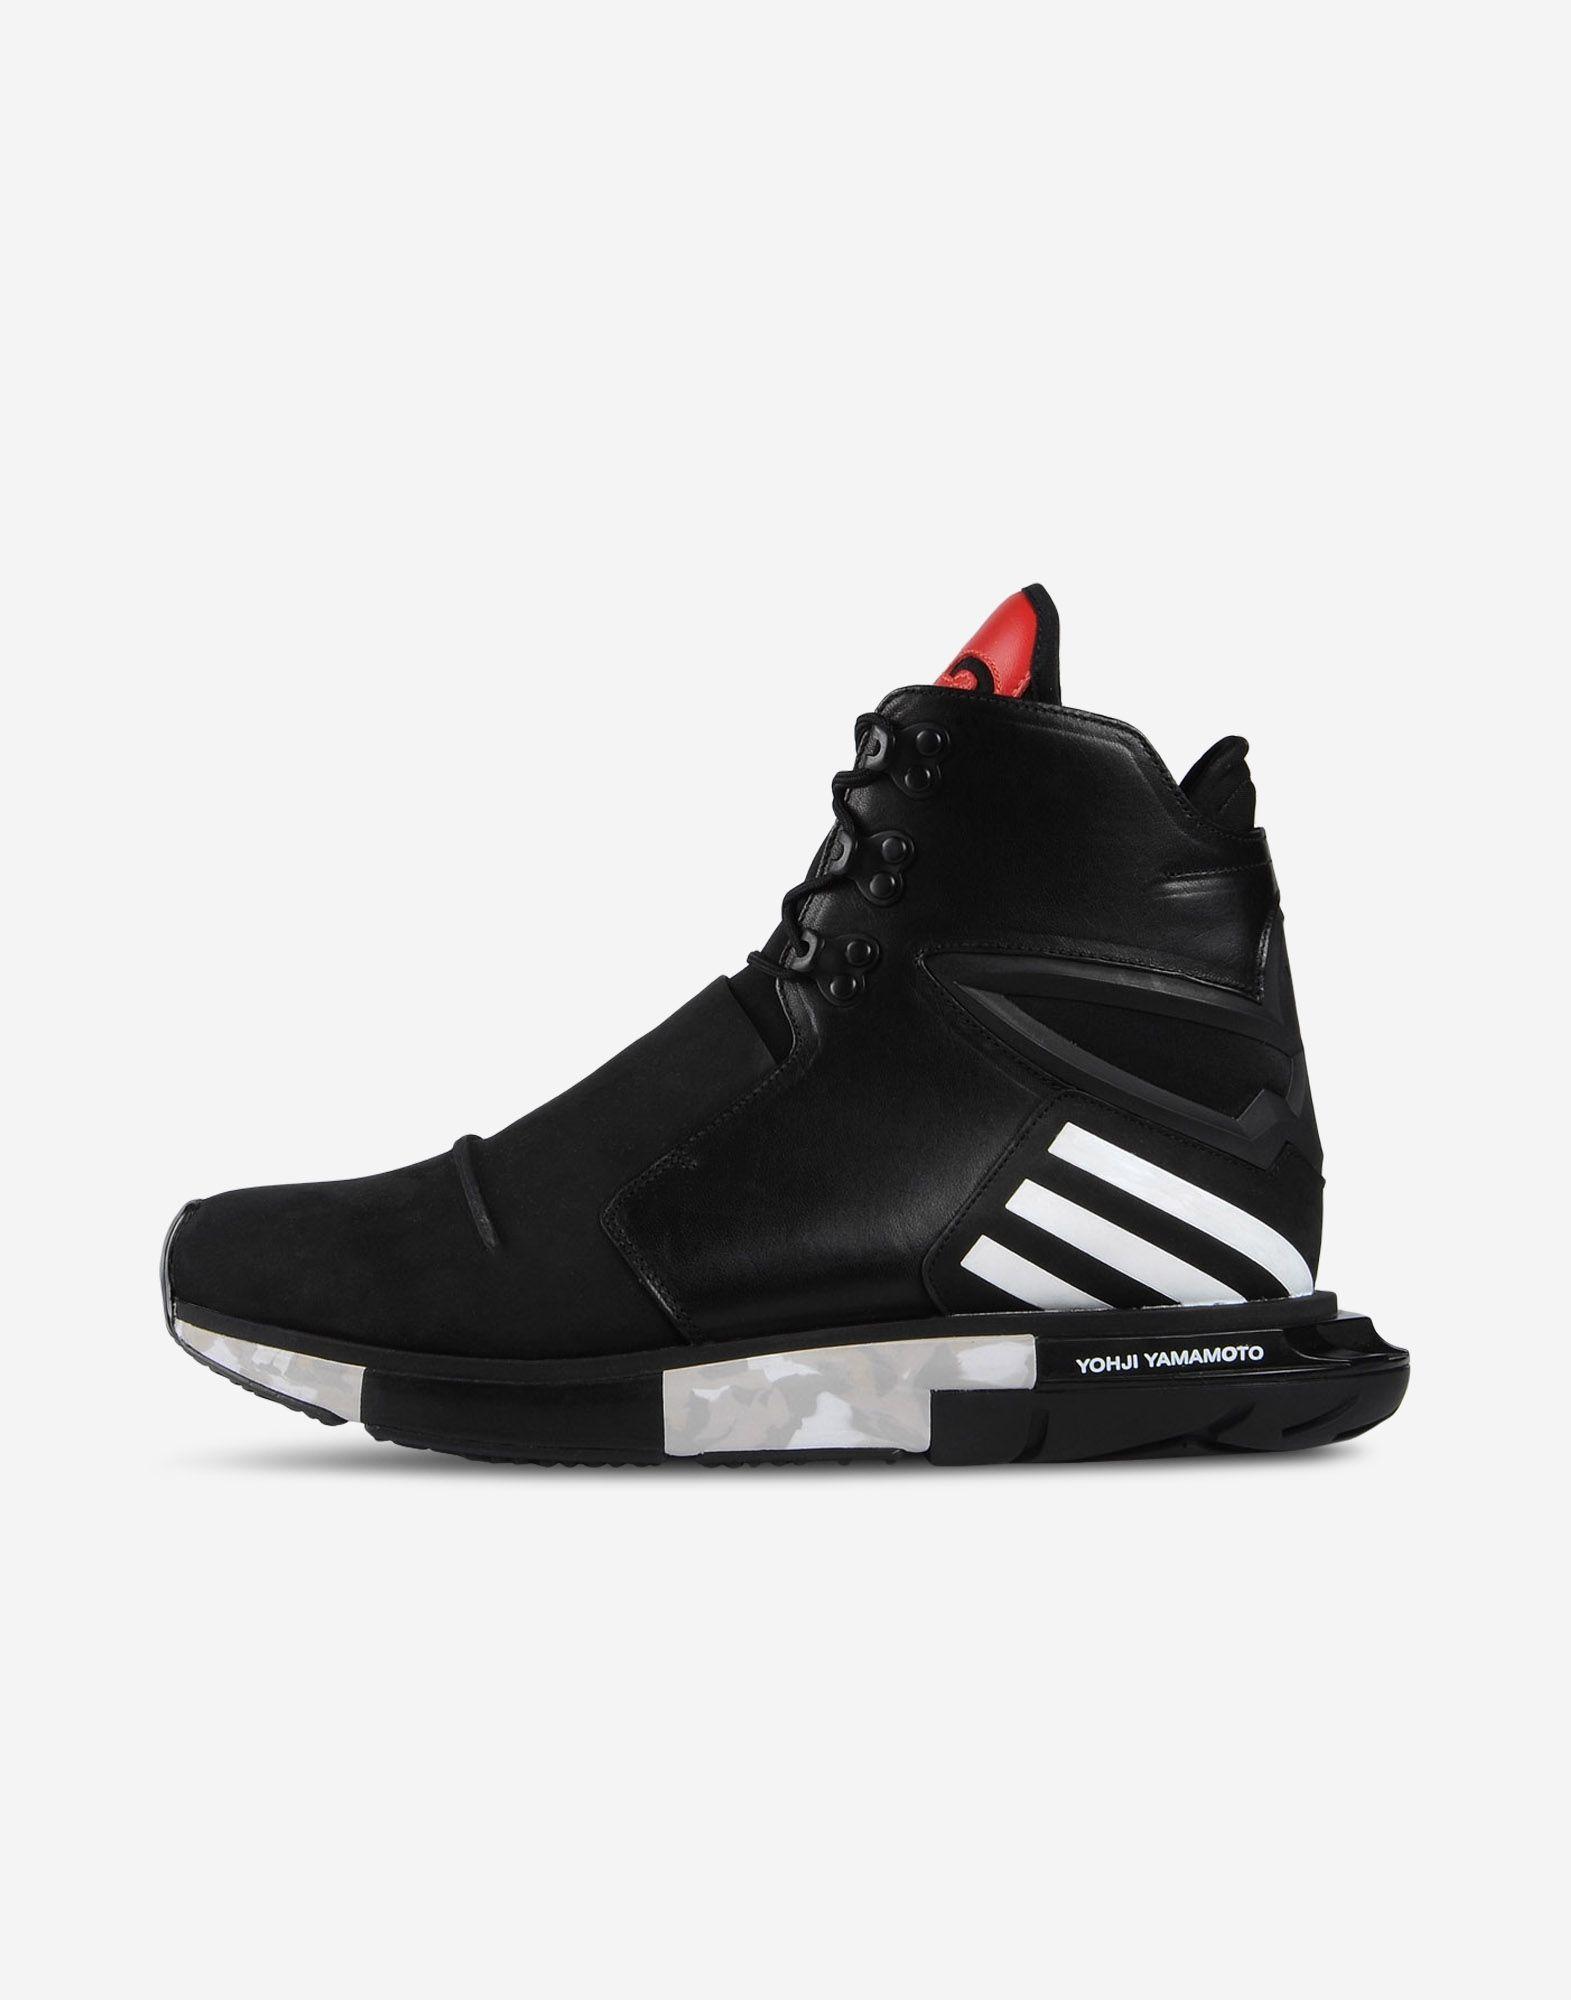 7844743ab9 Adidas Y-3 HAYEX HIGH Yohji Yamamoto Shoes, Adidas High Tops, Shoe Story